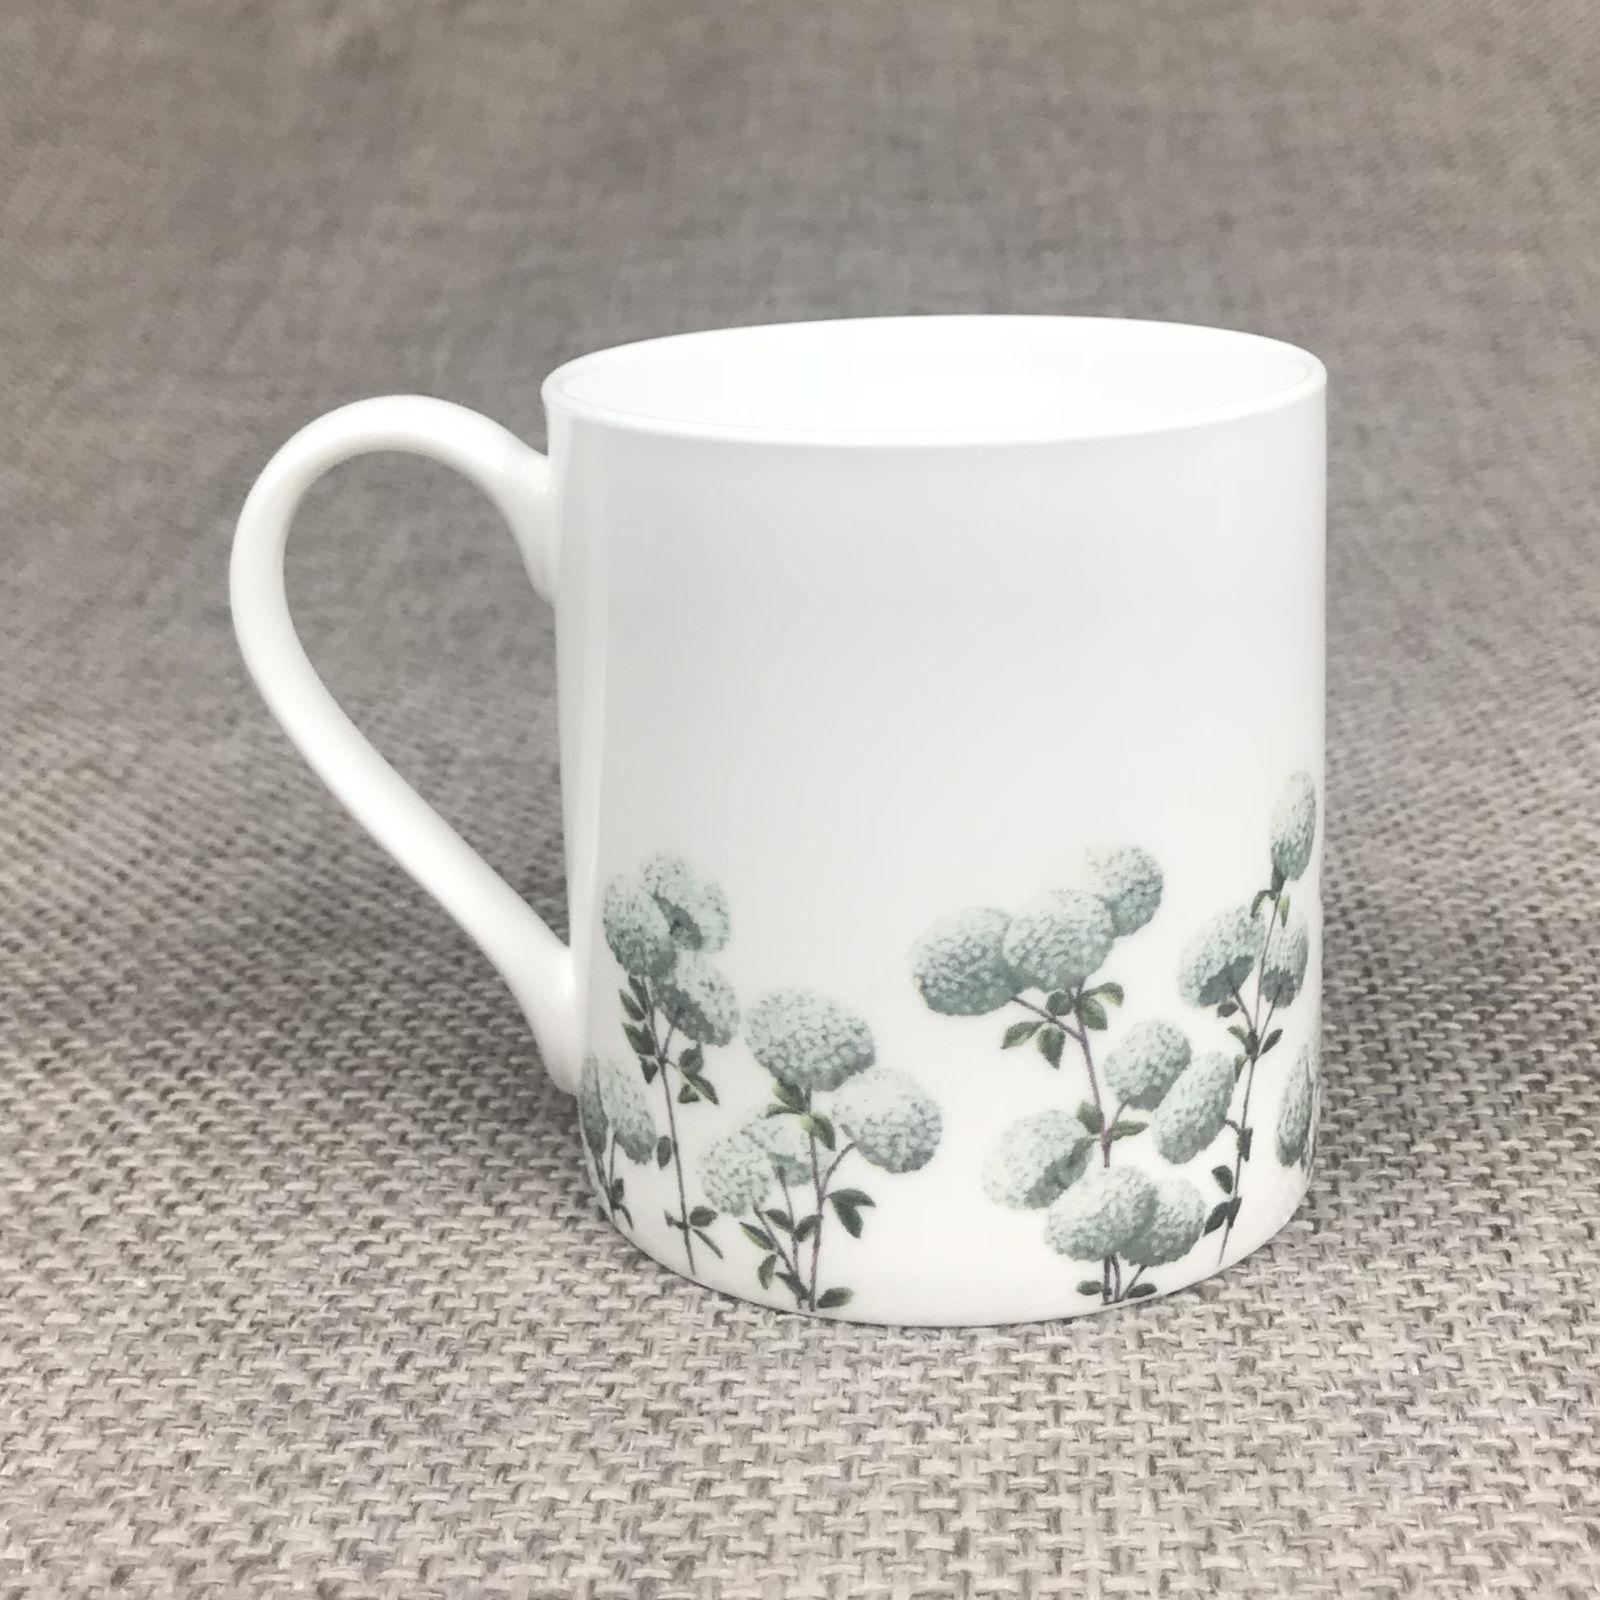 Viburnum Large Mug - aqua